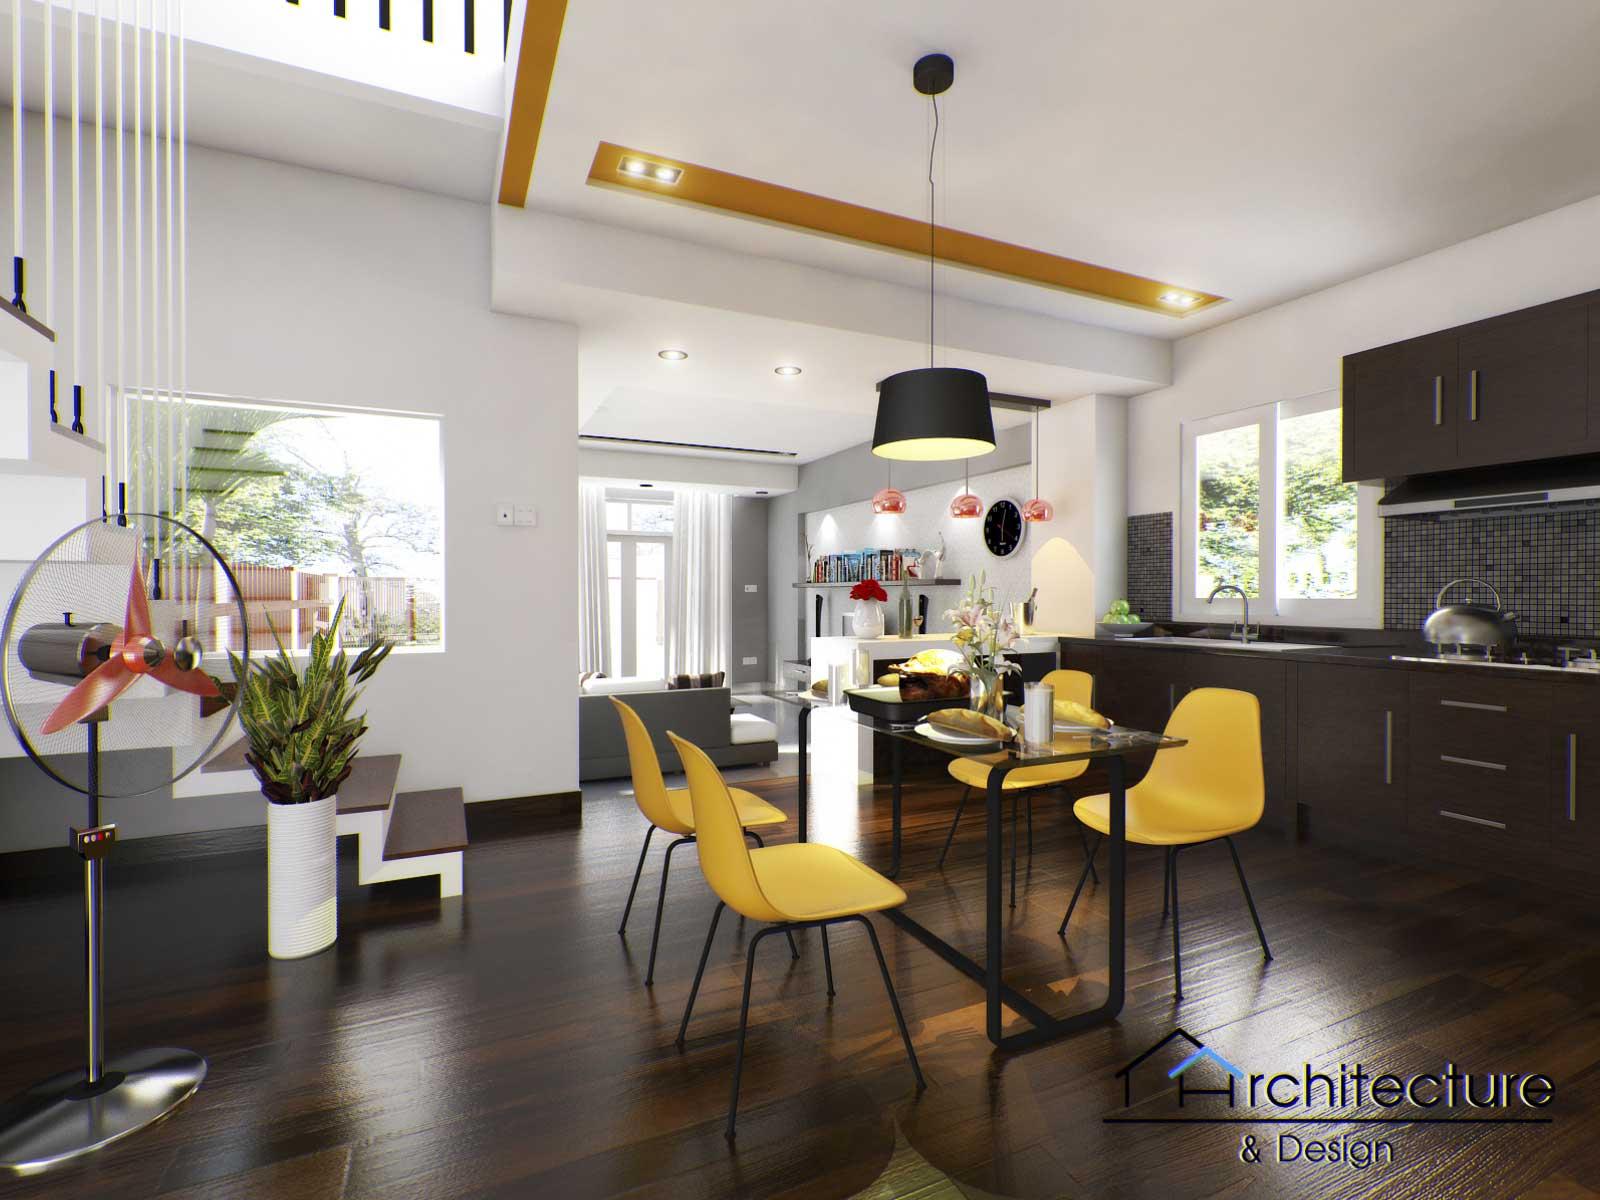 Model Living Room. sketchup models living room  2 vray render c SKETCHUP TEXTURE FREE MODEL LIVING ROOM V RAY SETTING